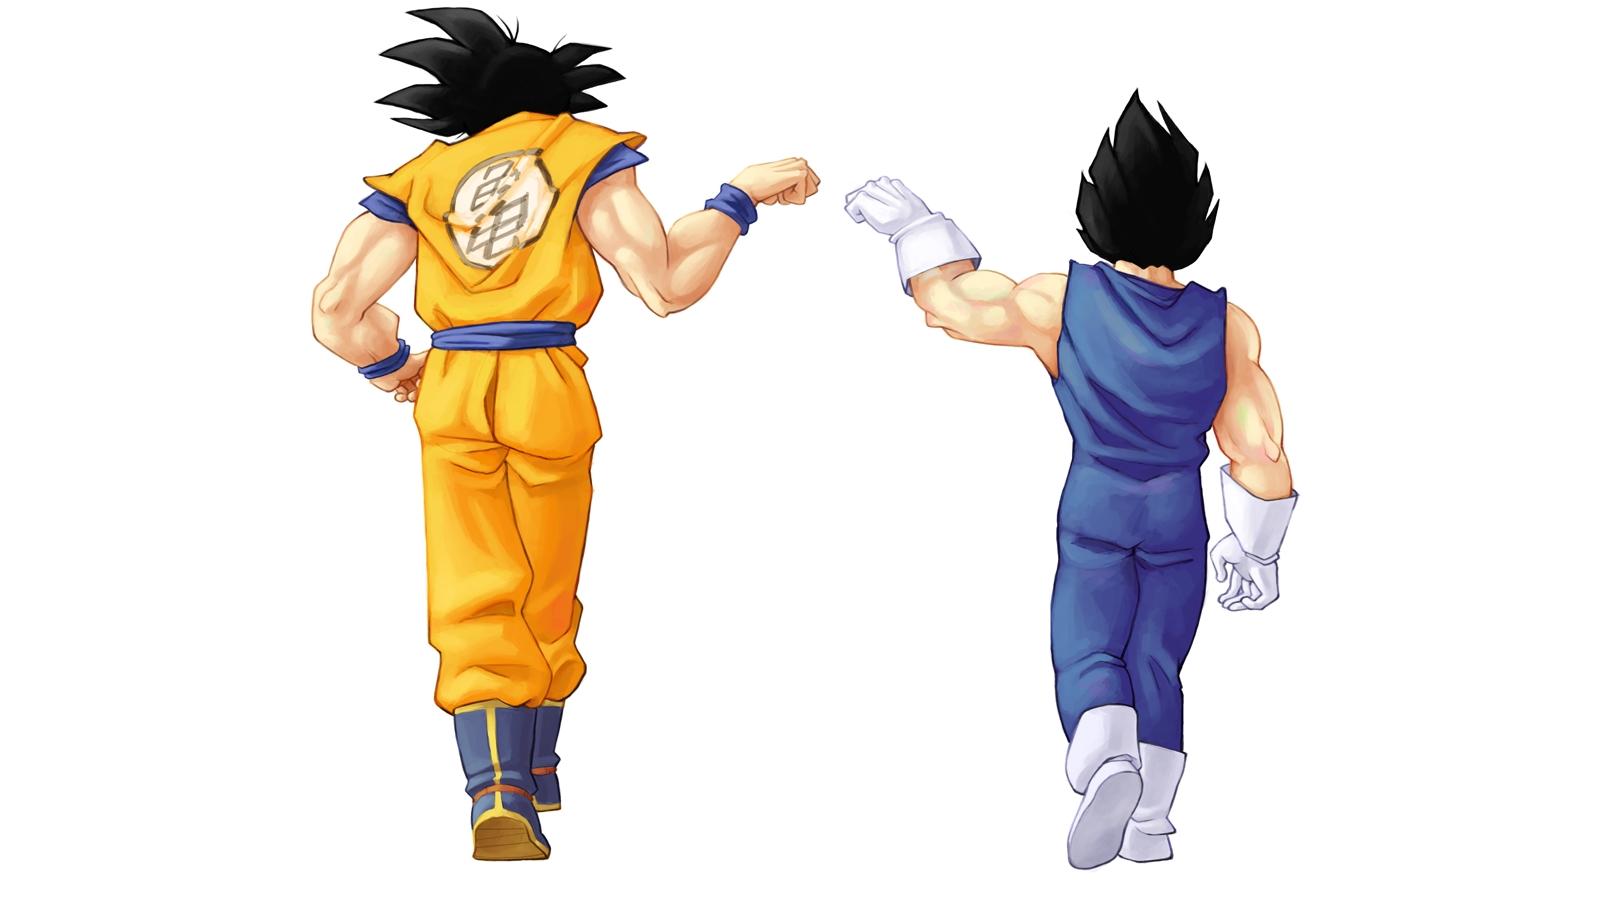 Vegeta Goku Wallpaper 1600x900 Vegeta Goku Dragon Ball Z 1600x900